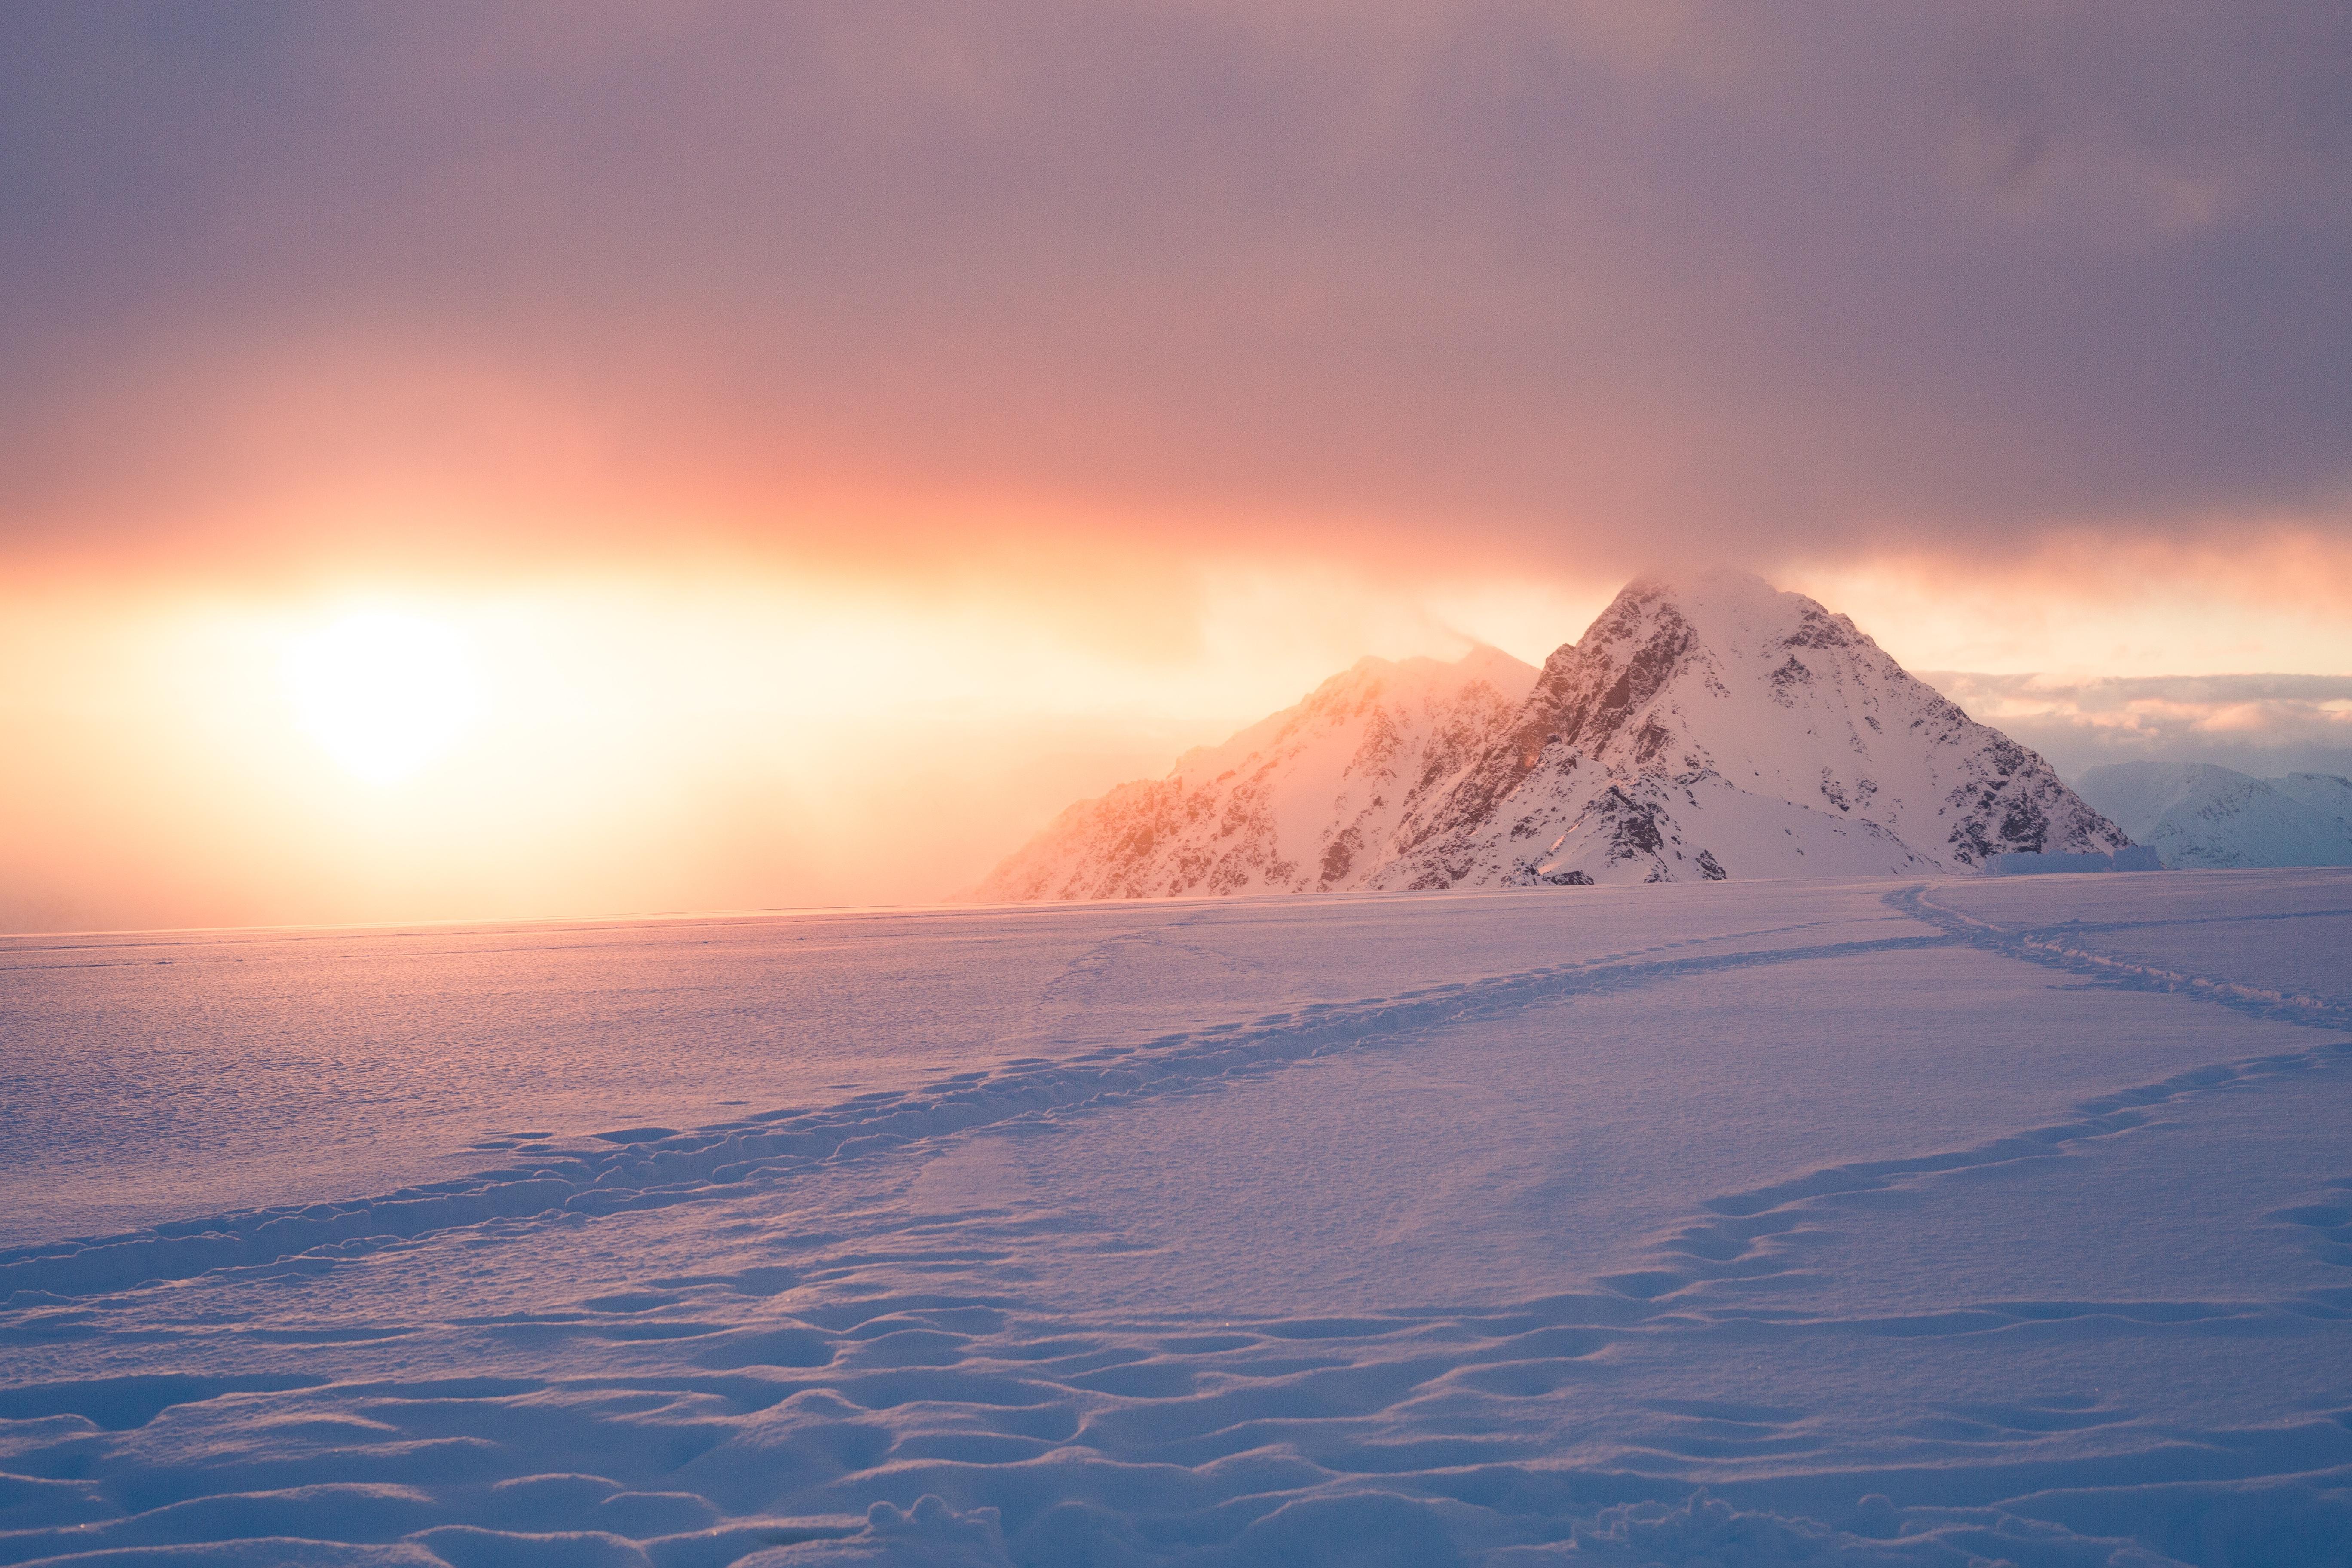 General 5472x3648 nature snow mountains mist